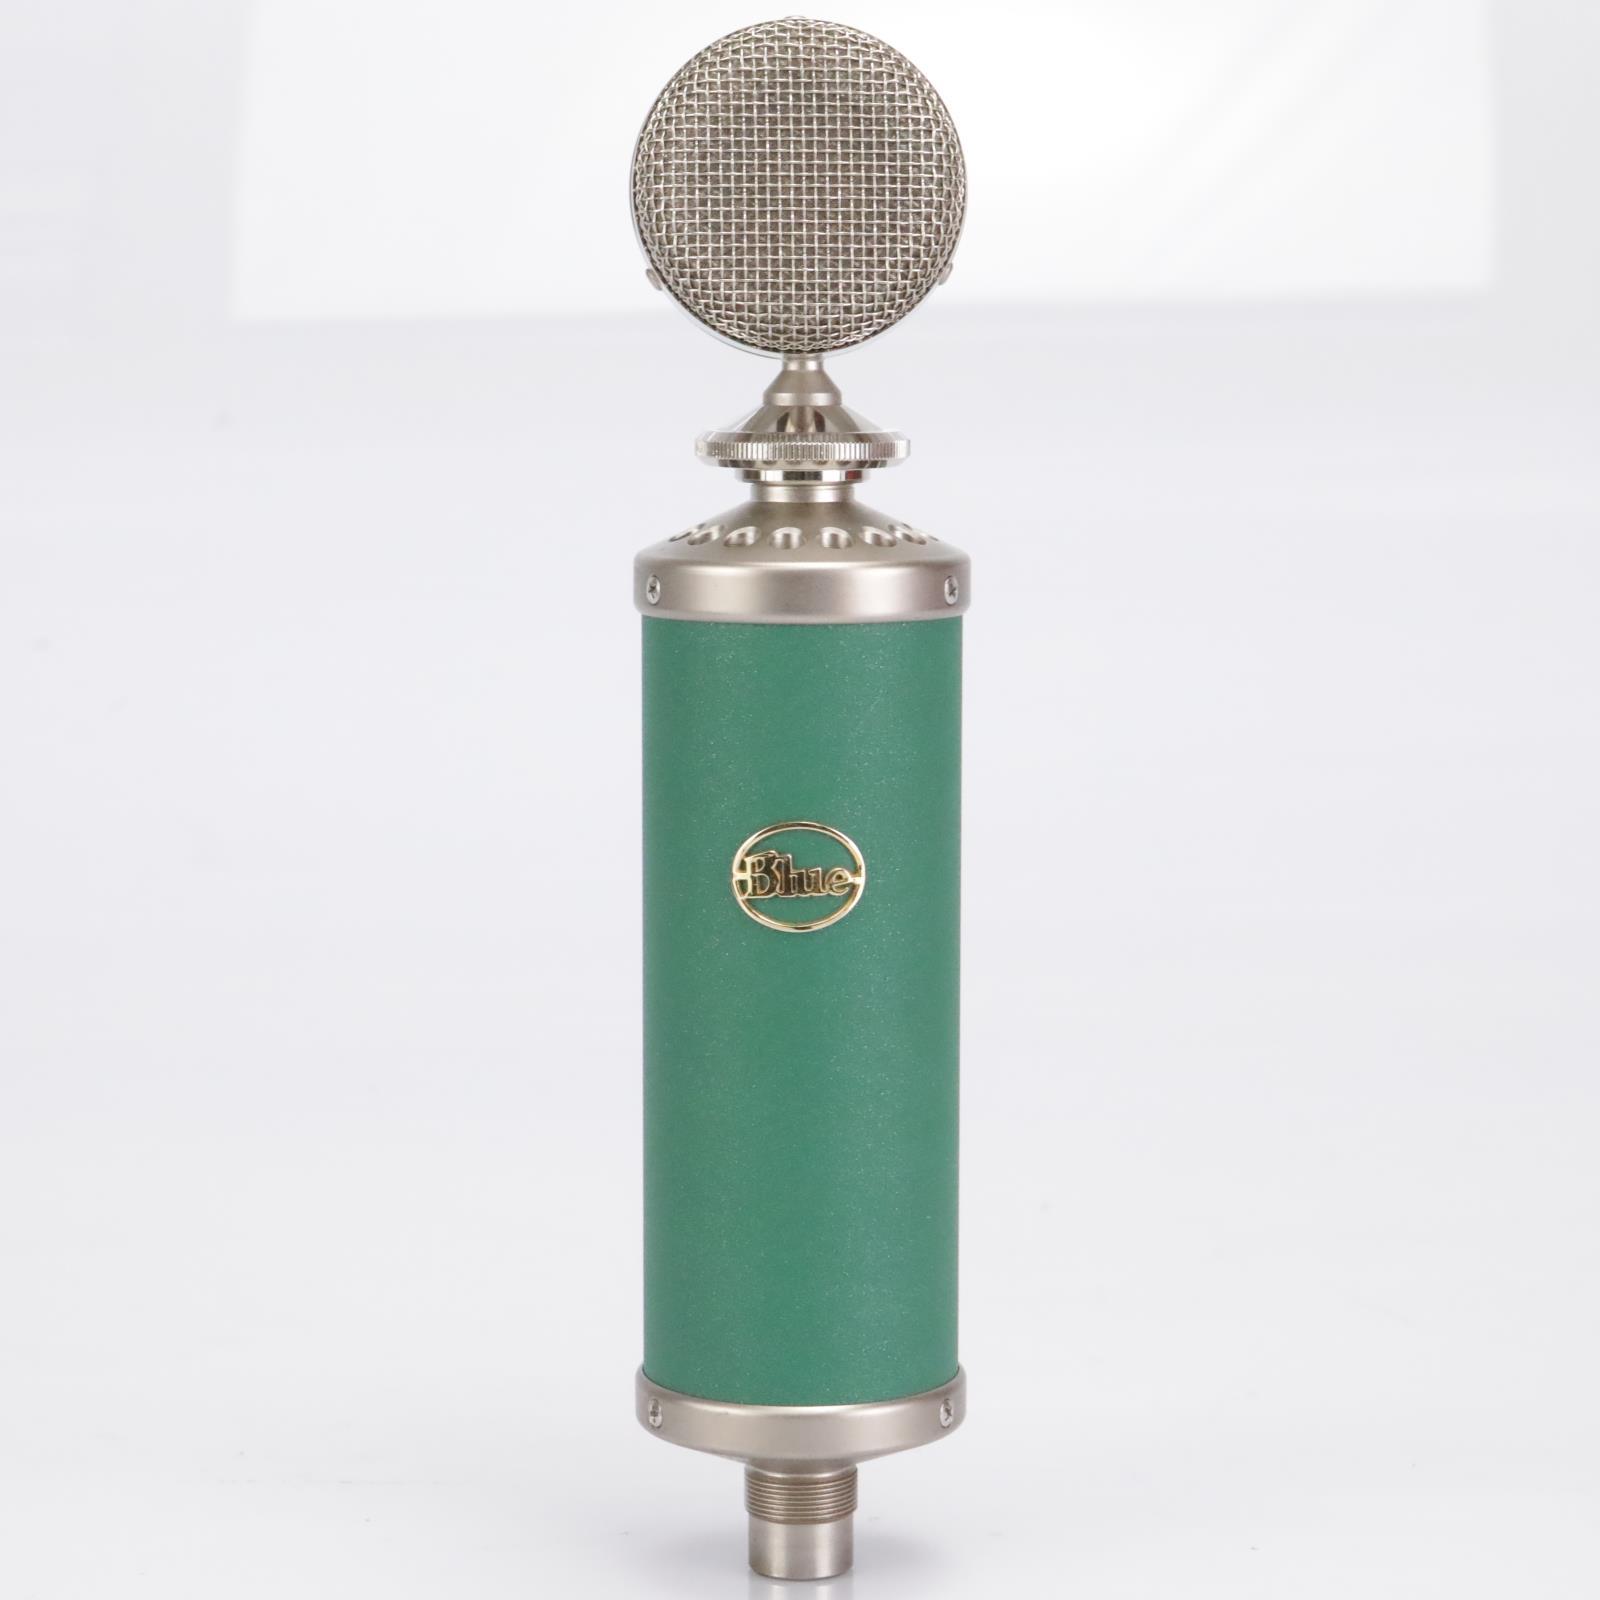 Blue Microphones Kiwi Multi-Pattern Condensor Microphone w/ Case #42812